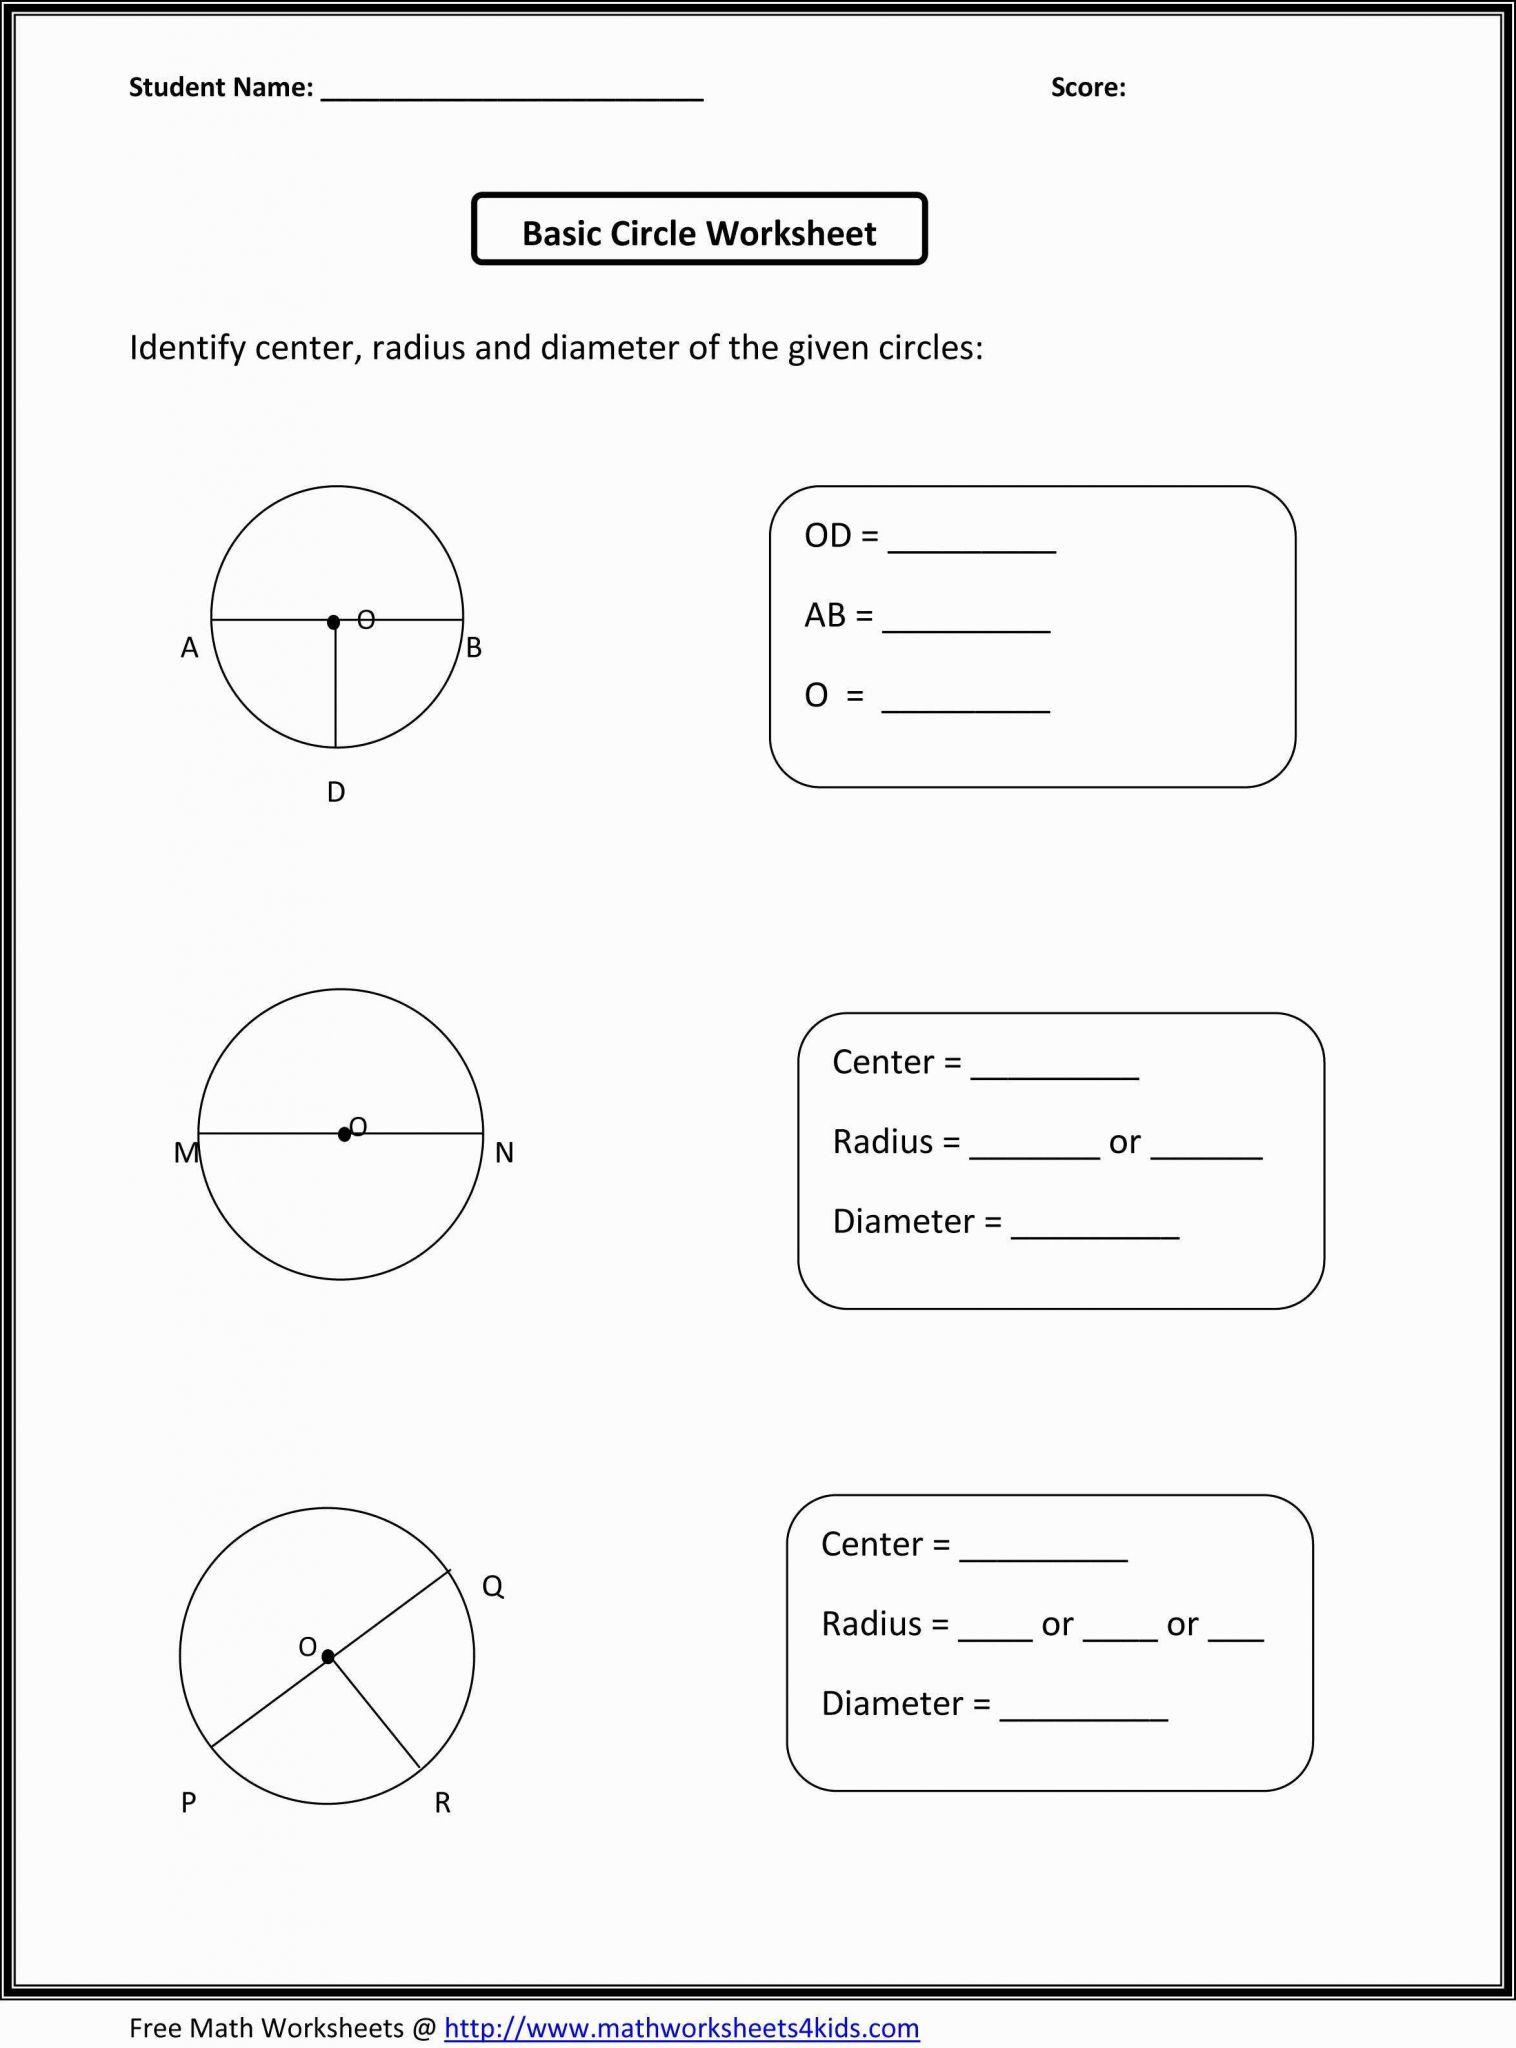 Art History Worksheets With Dewey Decimal System Math